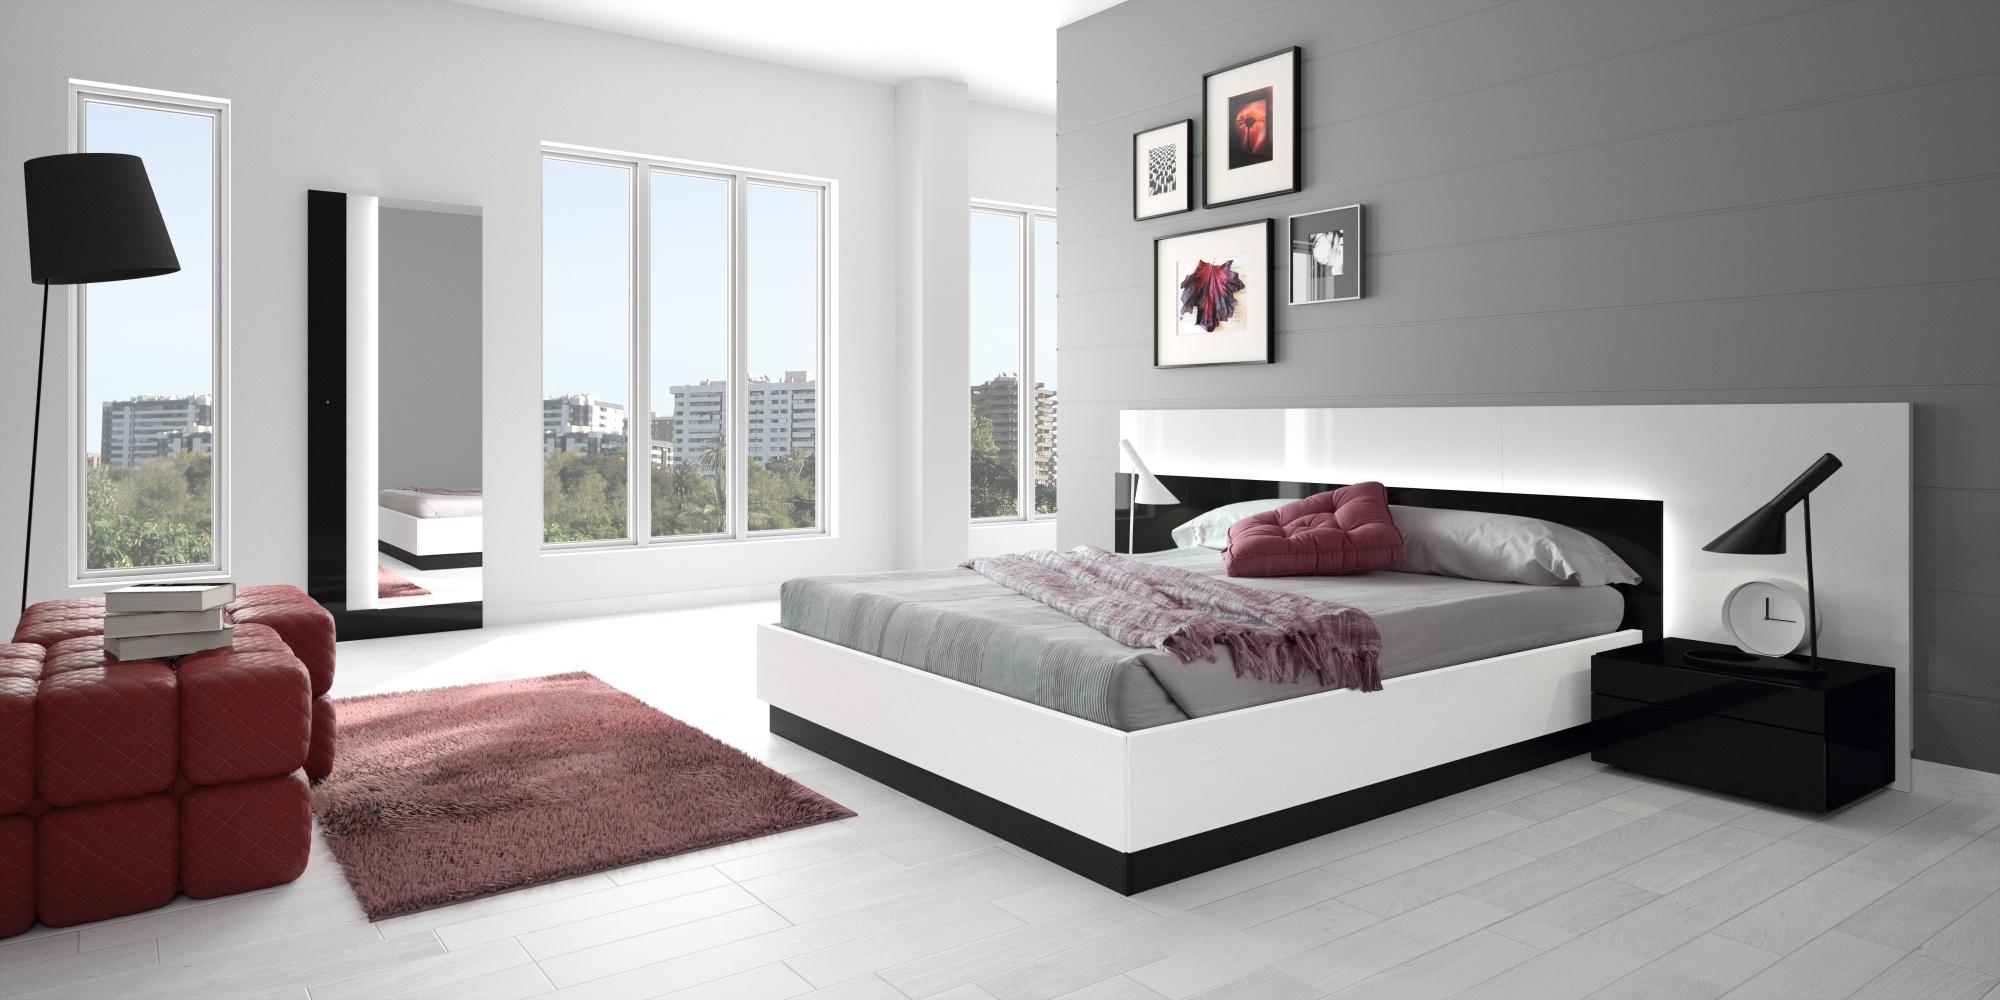 bedroom furniture designs images photo - 8